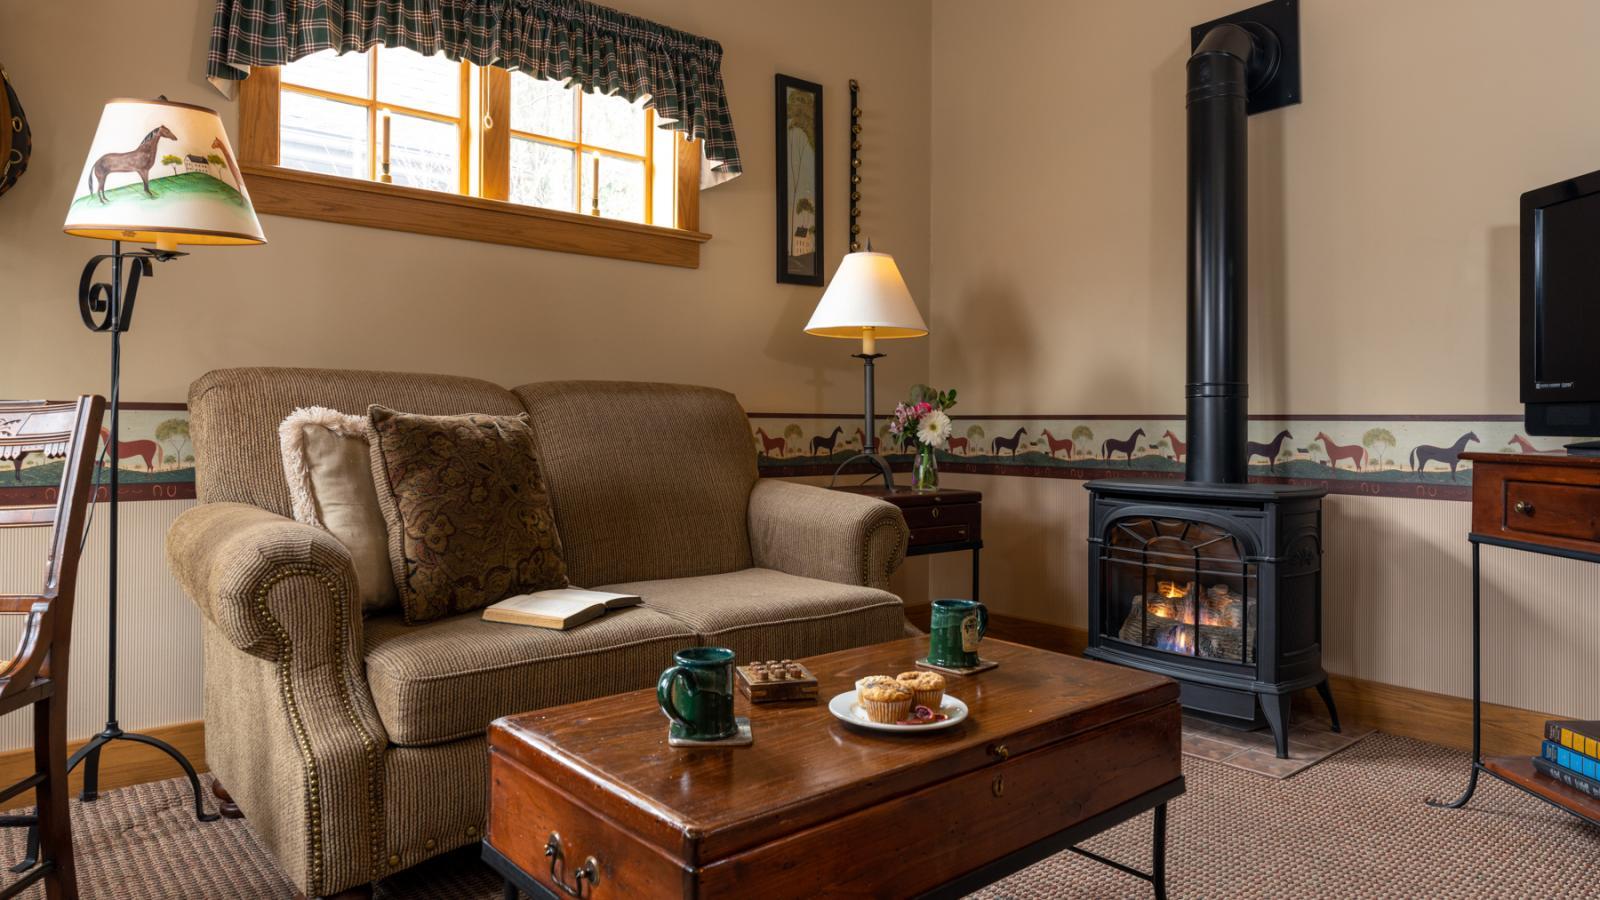 B&B Room with Fireplace